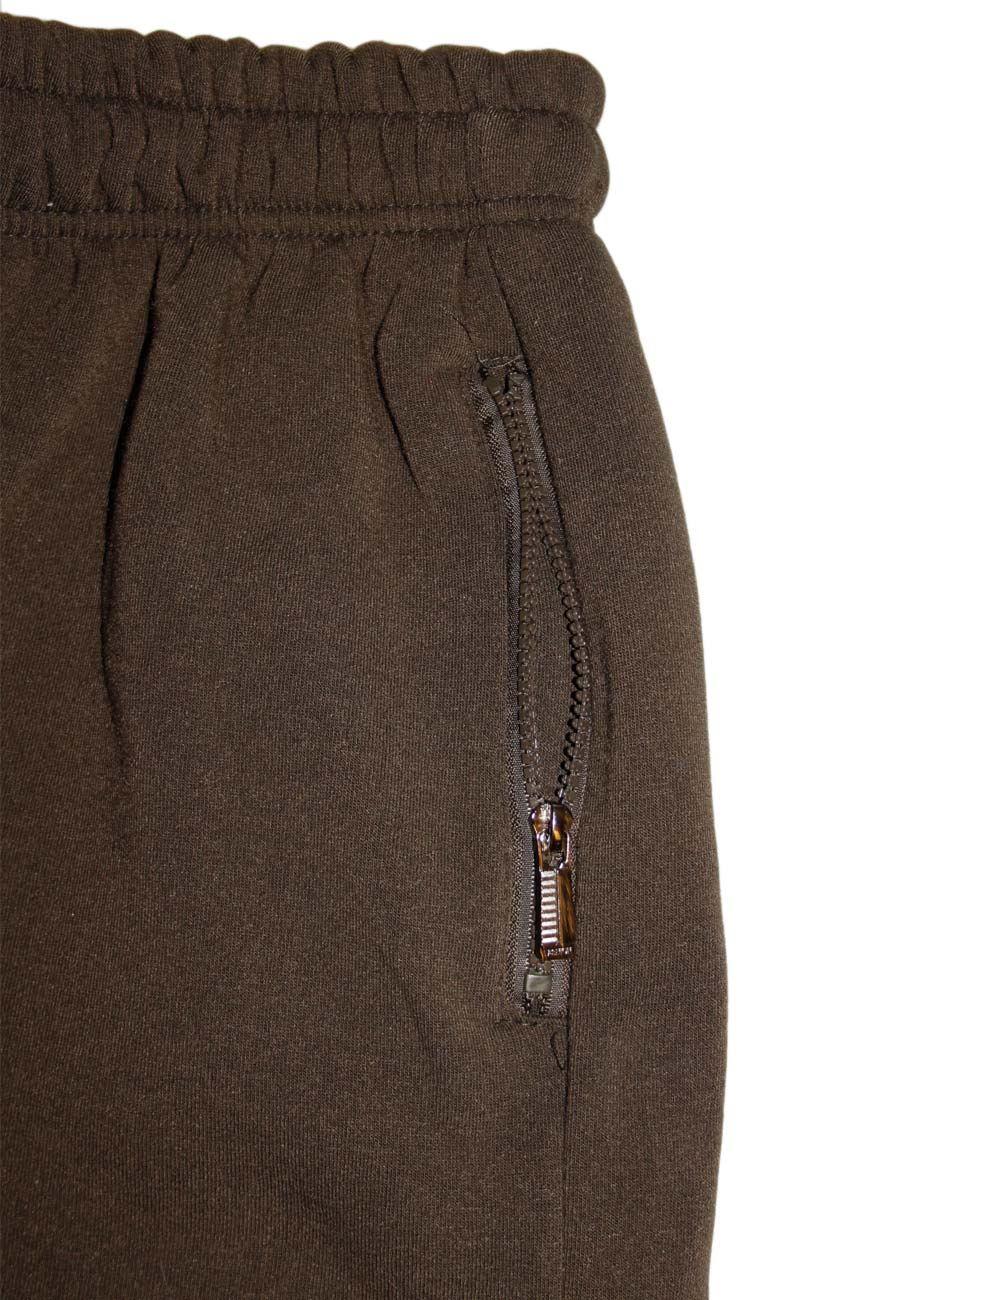 Mens-Women-Plain-Fleece-Joggers-Bottoms-Jogging-Pant-Gym-Fitness-Sports-Trousers thumbnail 10